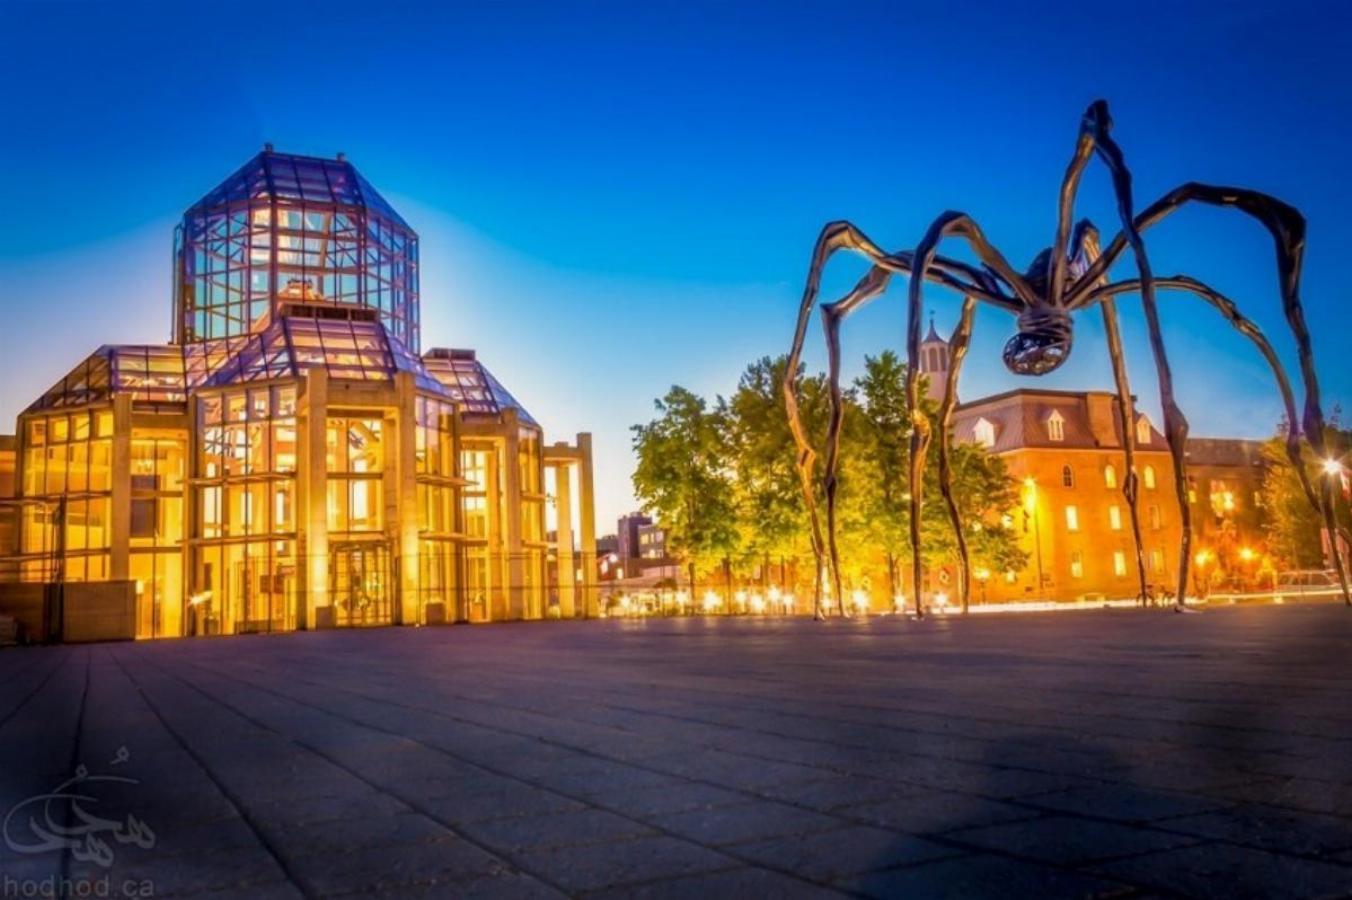 جاذبه های گردشگری کانادا: نگارخانه ملی کانادا